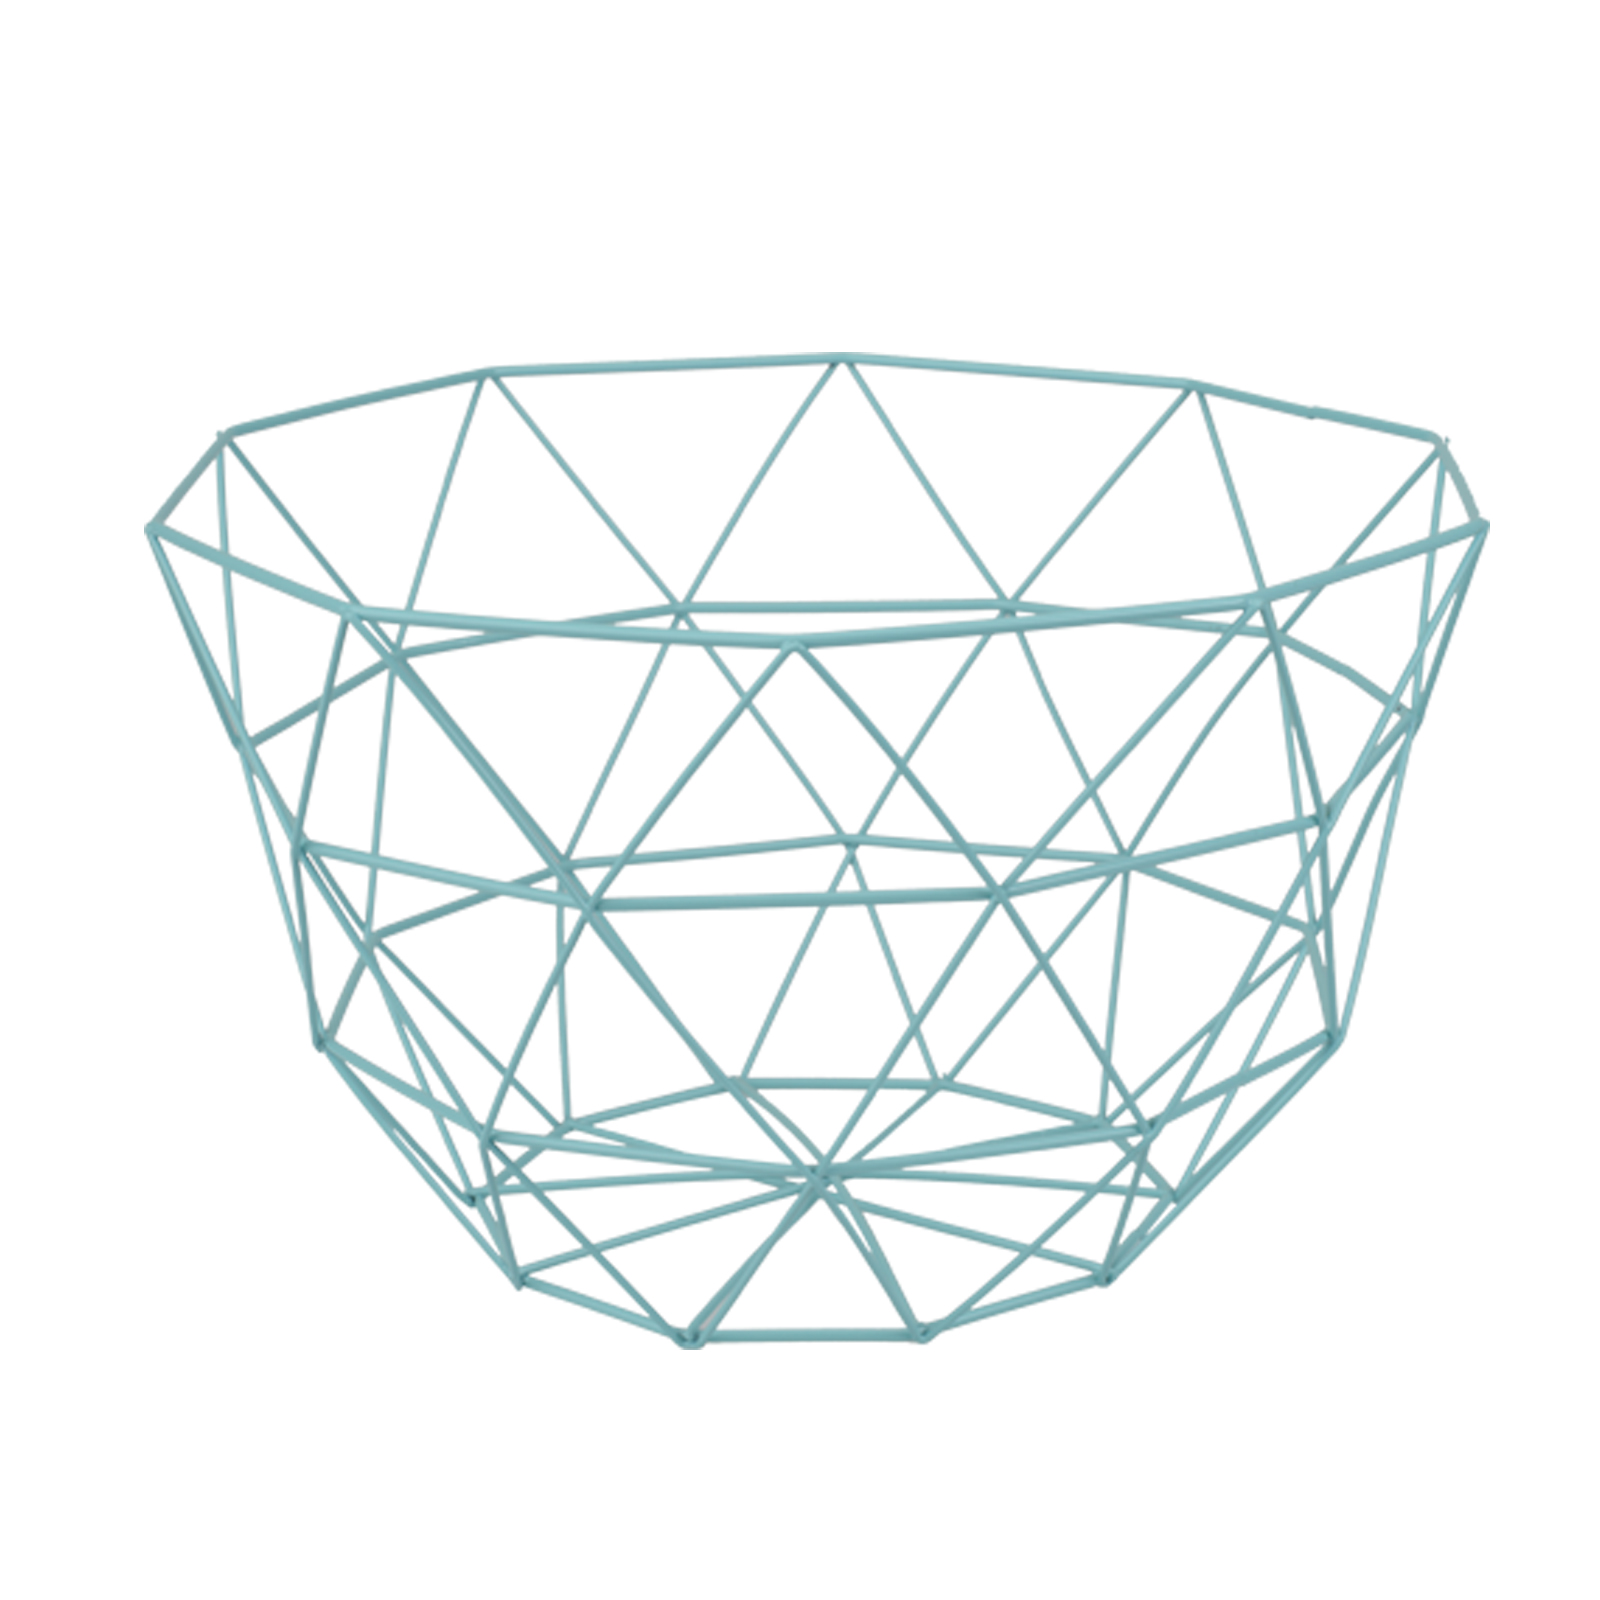 5 farben obstkorb drahtkorb gitterkorb metallkorb kartoffelkorb dekokorb ebay. Black Bedroom Furniture Sets. Home Design Ideas